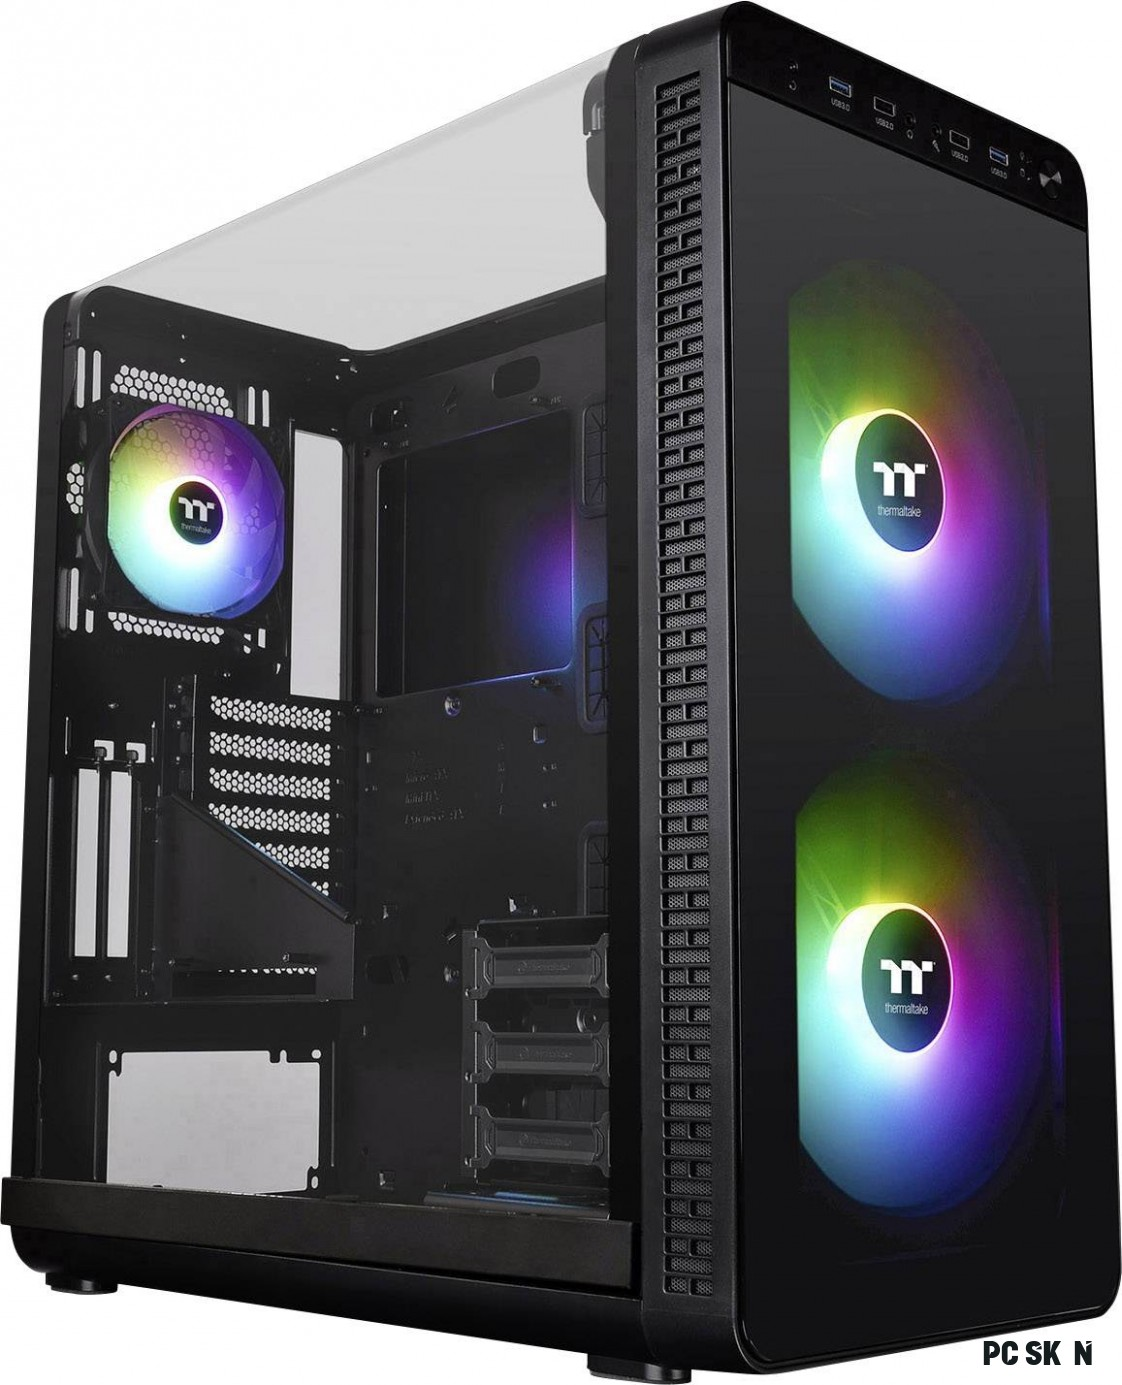 Thermaltake View 12 ARGB (Pure RGB) midi tower PC skříň černá 12  předinstalované LED ventilátory, boční okno, instalace p